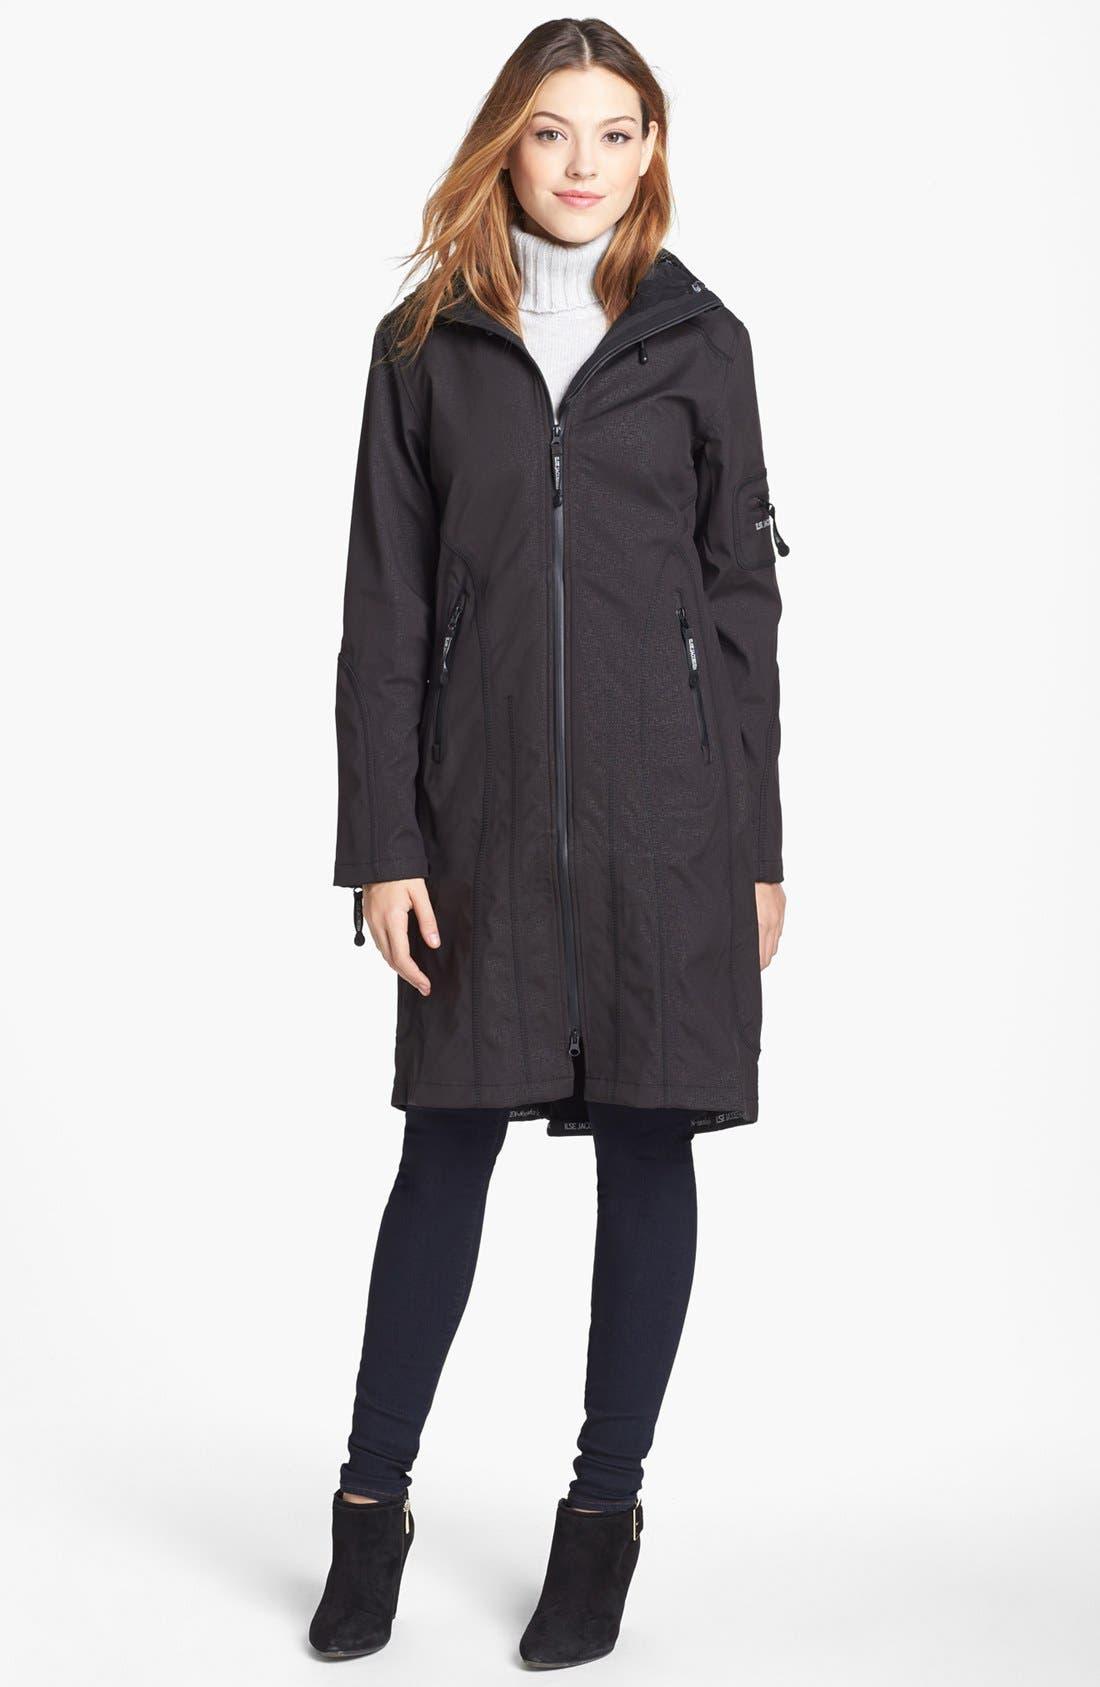 Ilse Jacobsen Hornbaek 'Rain 6' Hooded Waterproof Coat